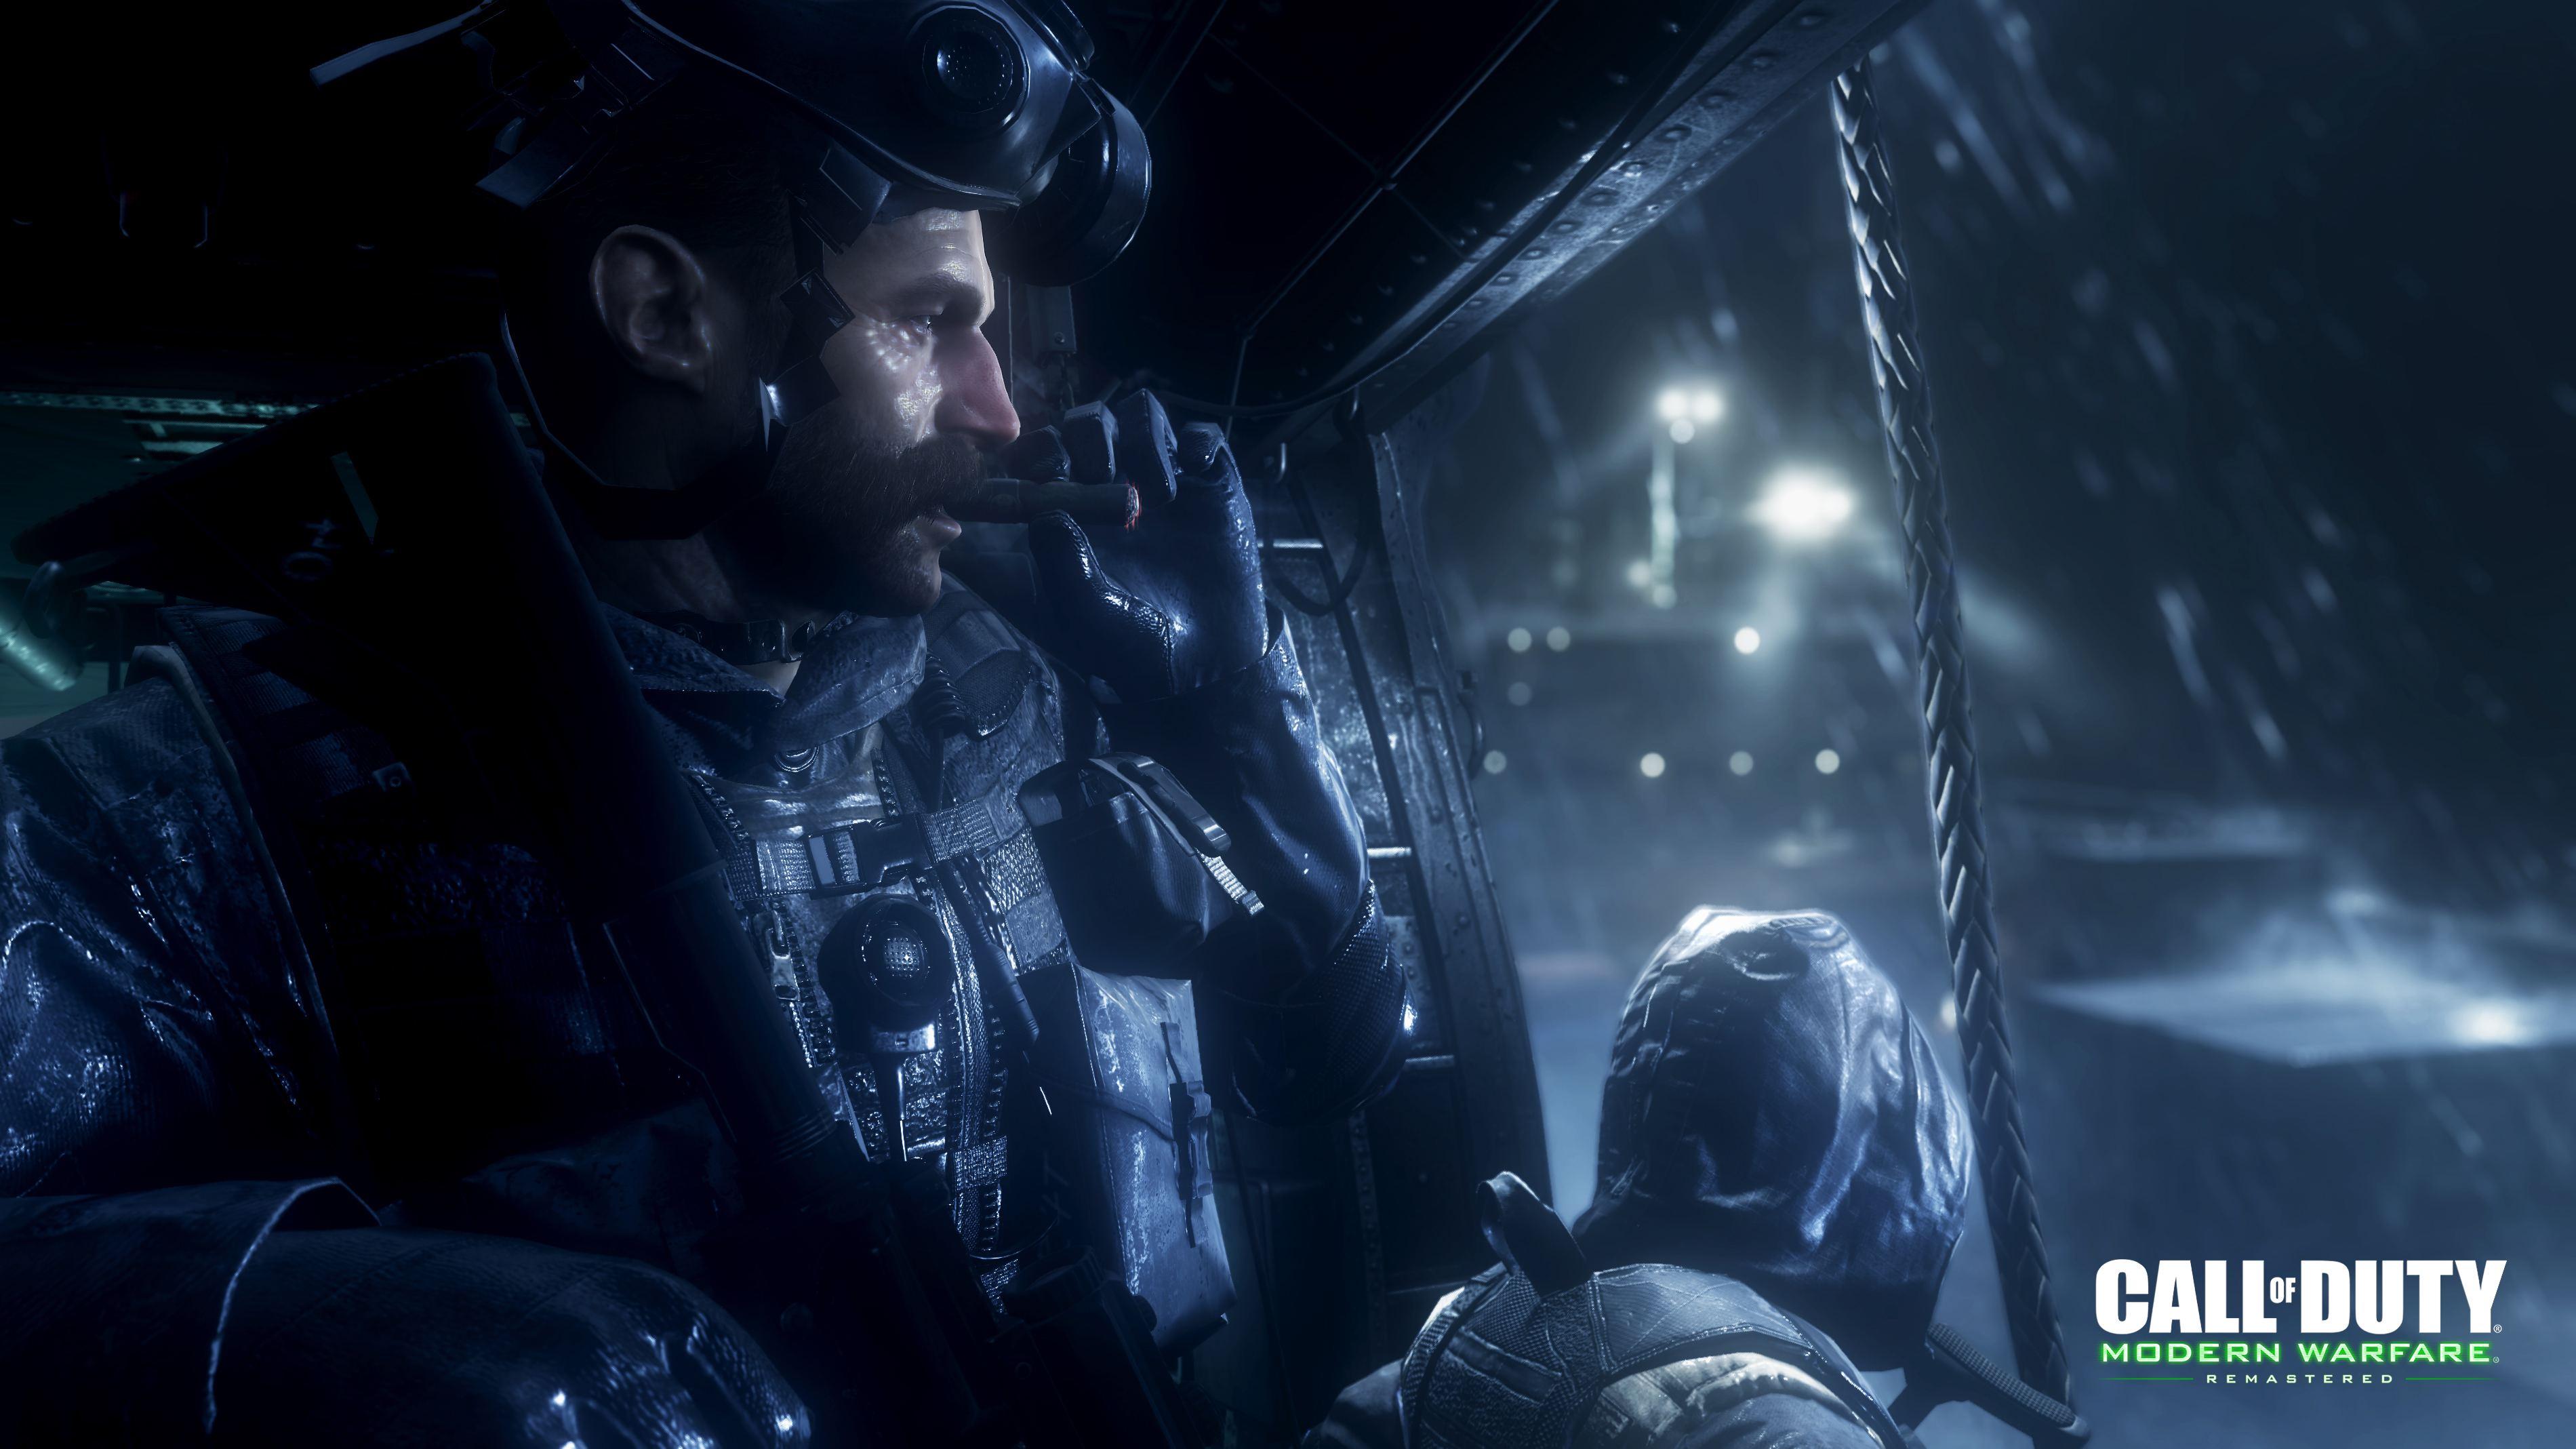 Call of duty modern warfare 2 multiplayer скачать торрент - 641